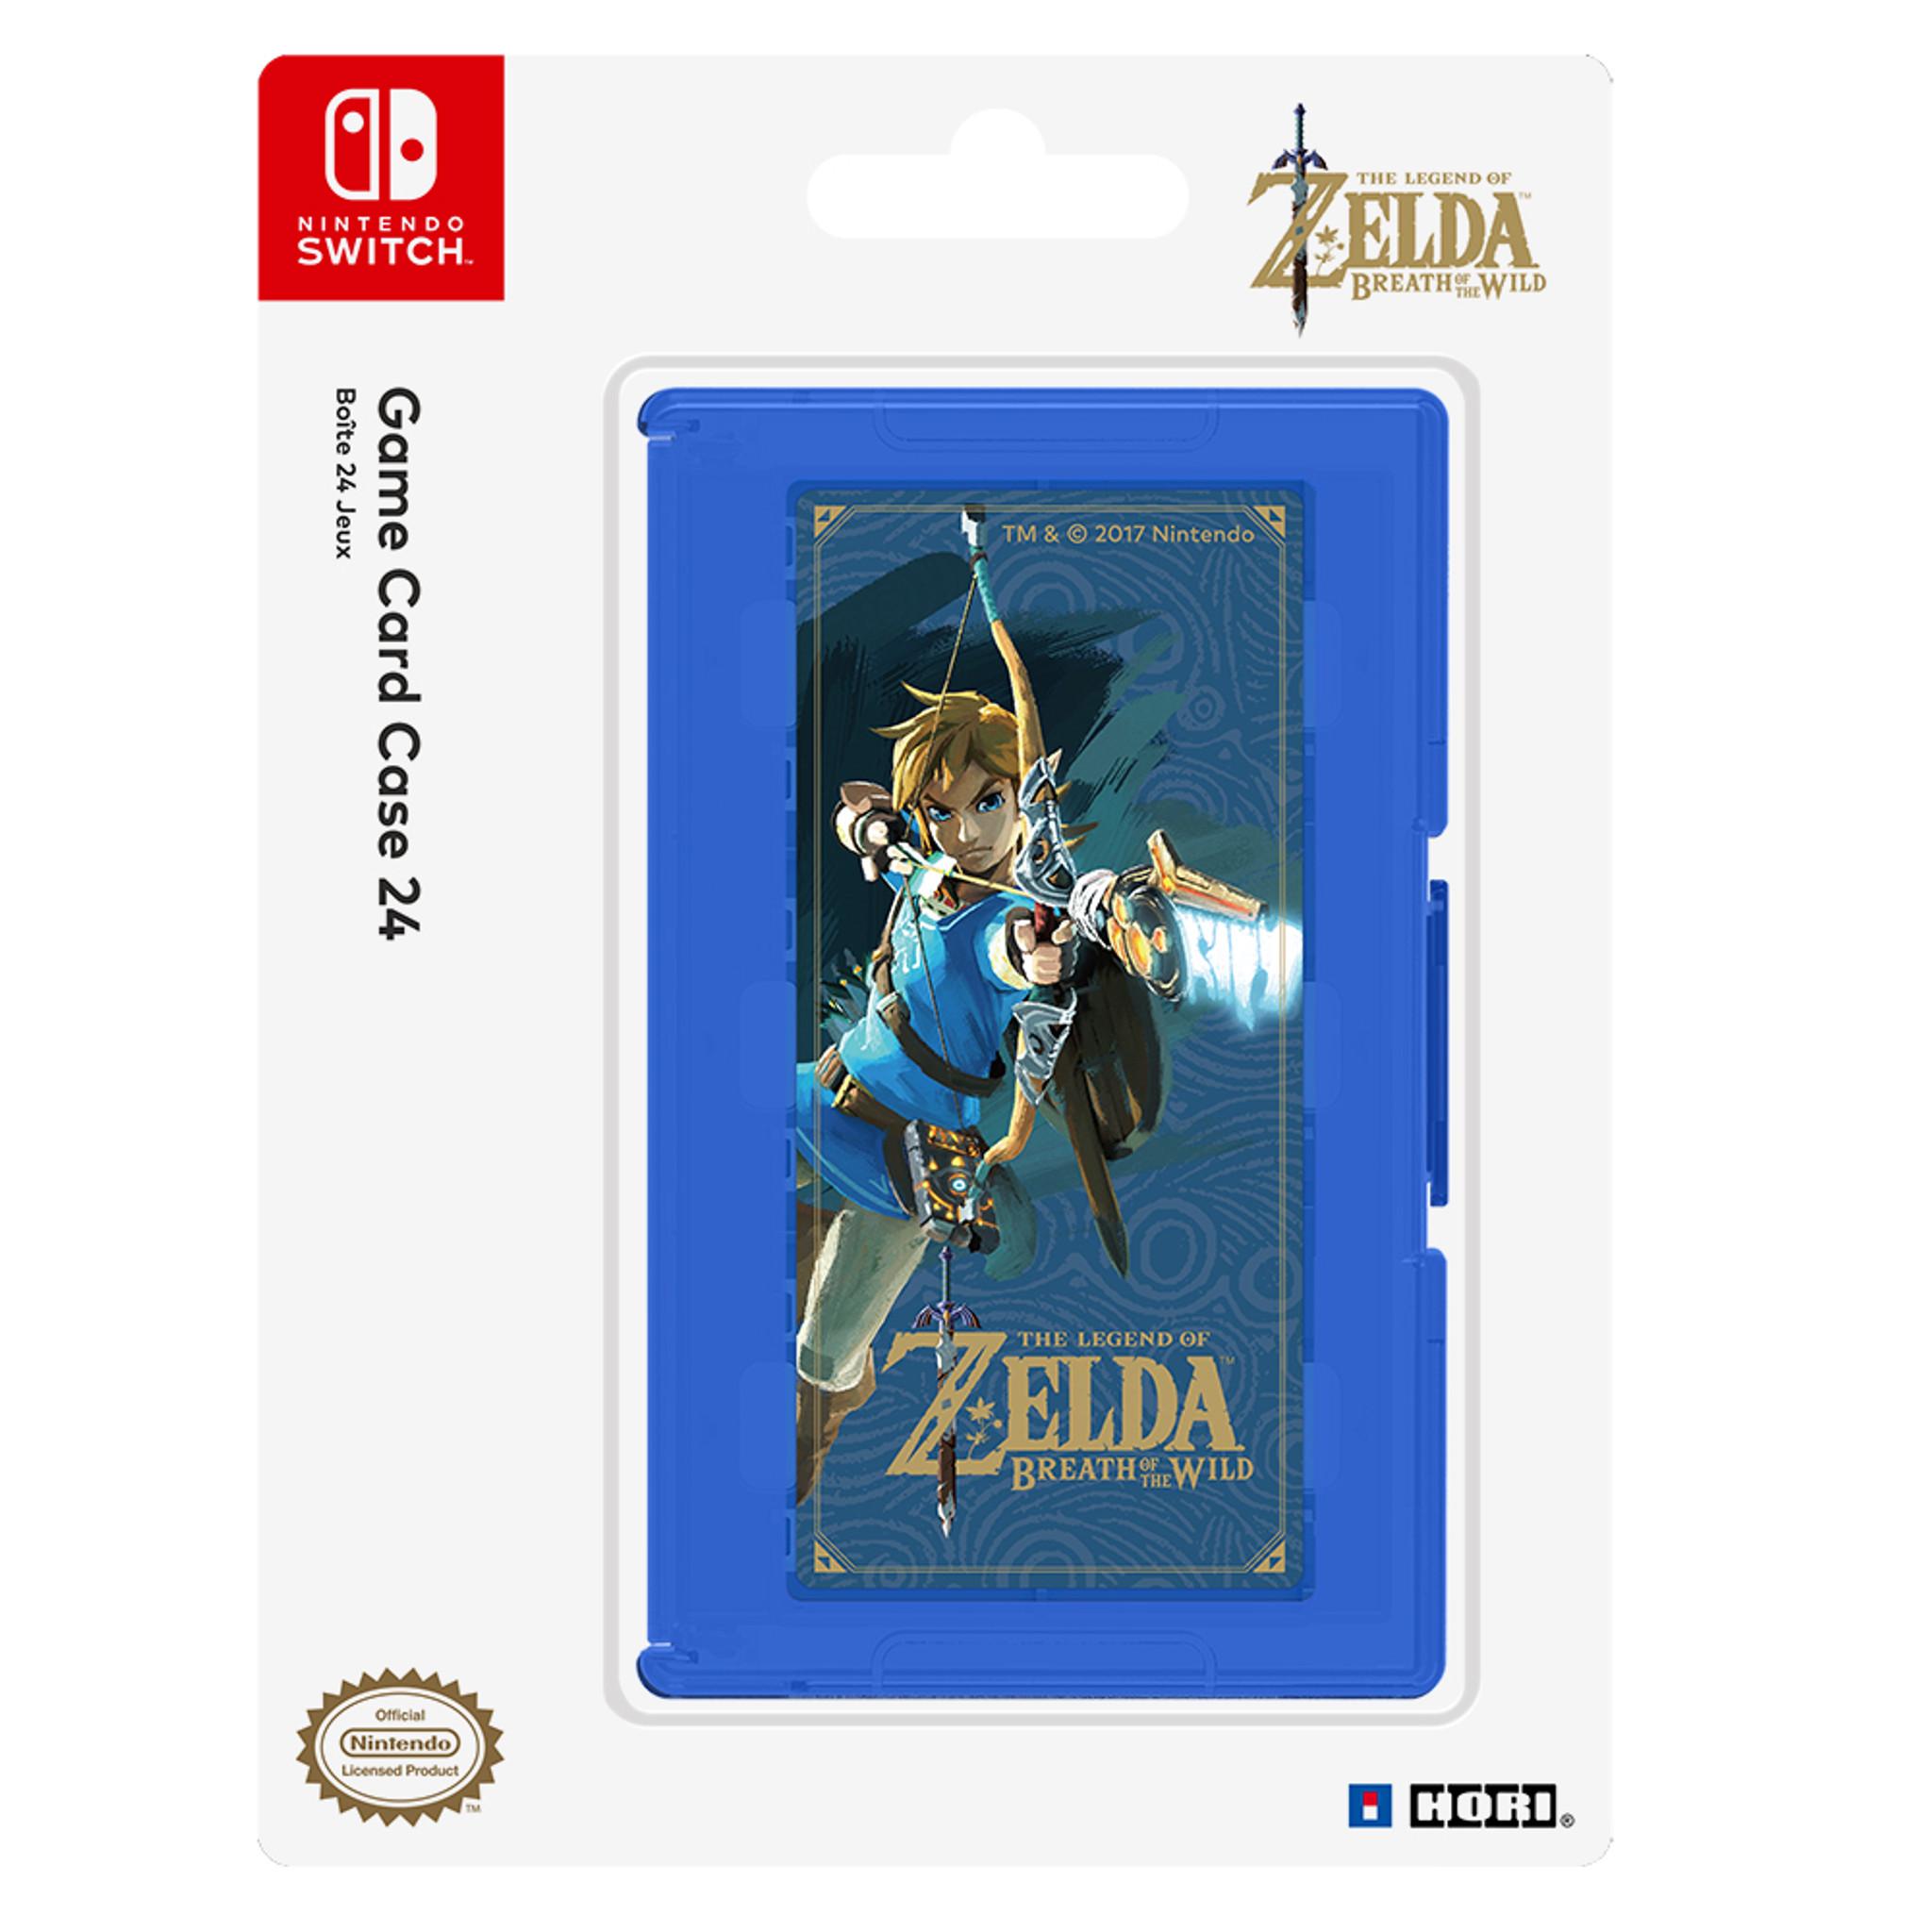 Game Card Case 24 (Zelda) for Nintendo Switch